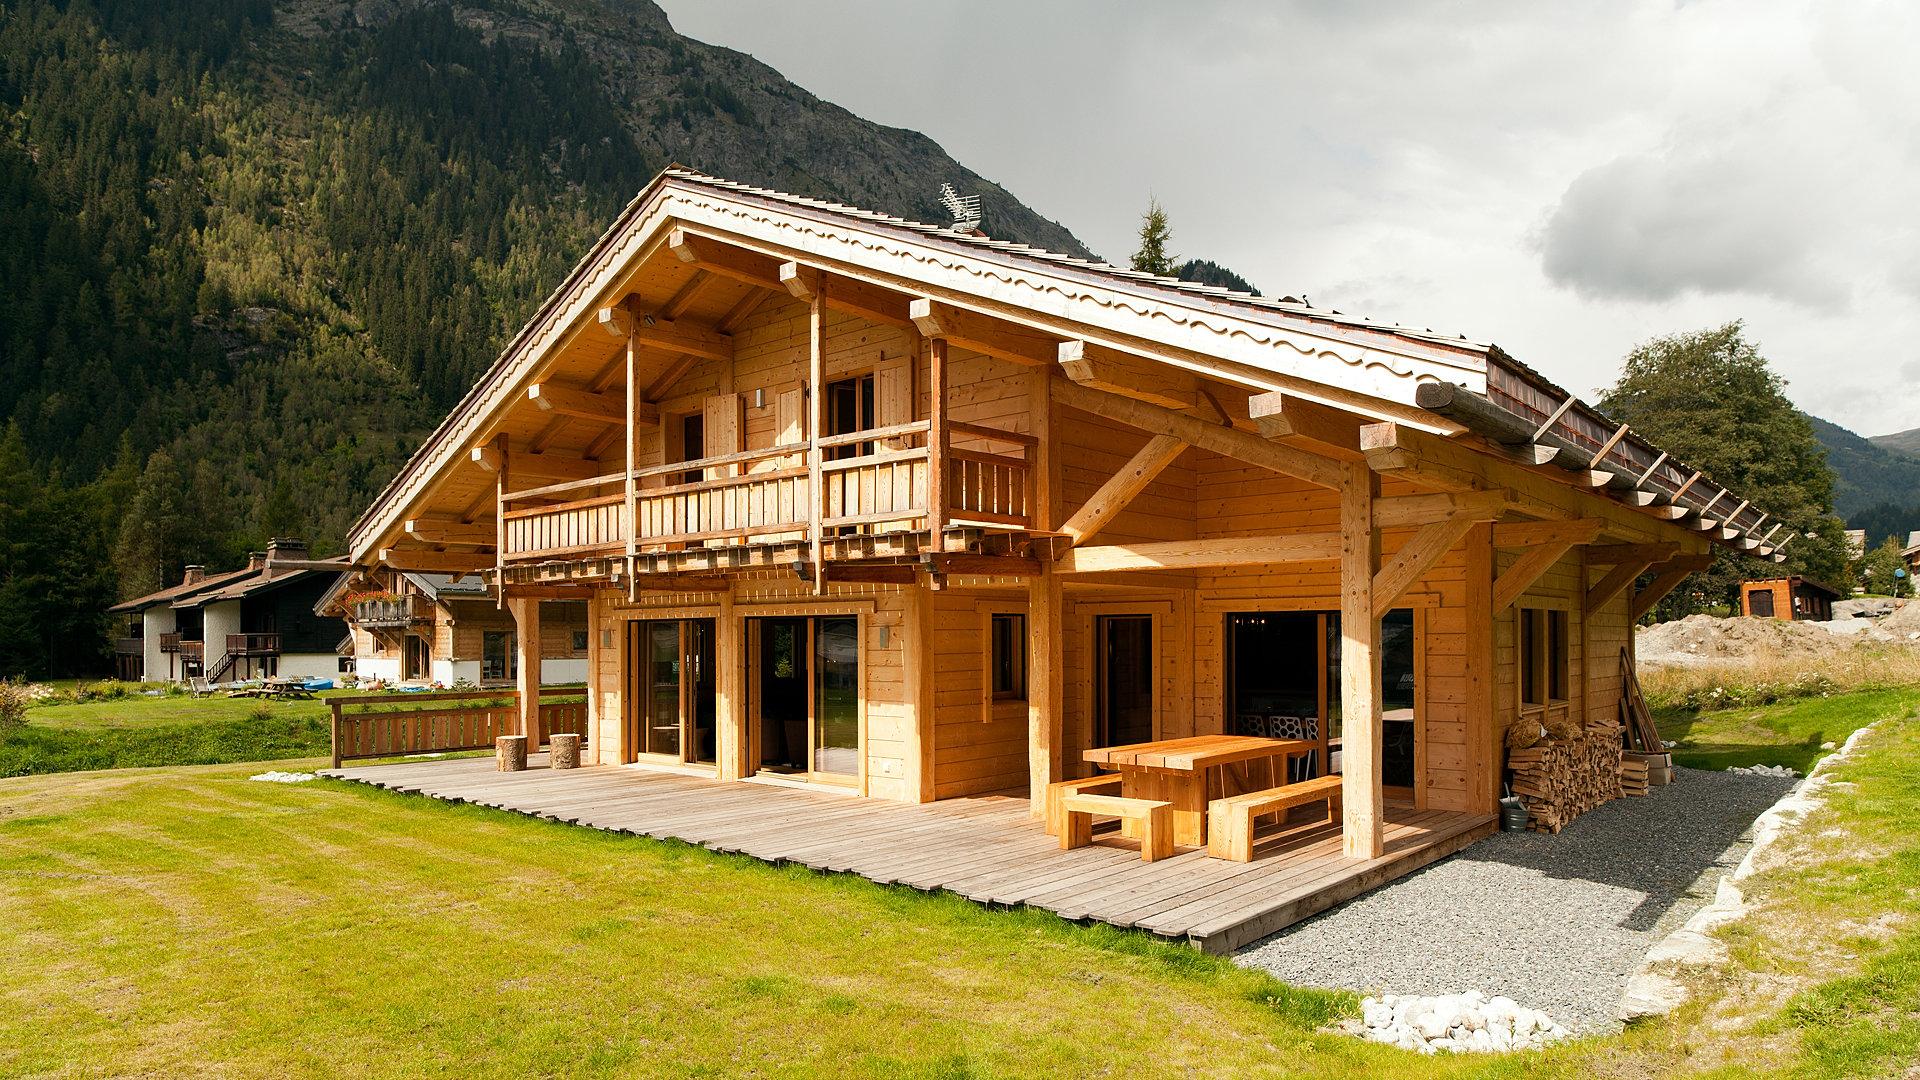 alessandro rovagna architecte maison c chamonix mont blanc. Black Bedroom Furniture Sets. Home Design Ideas